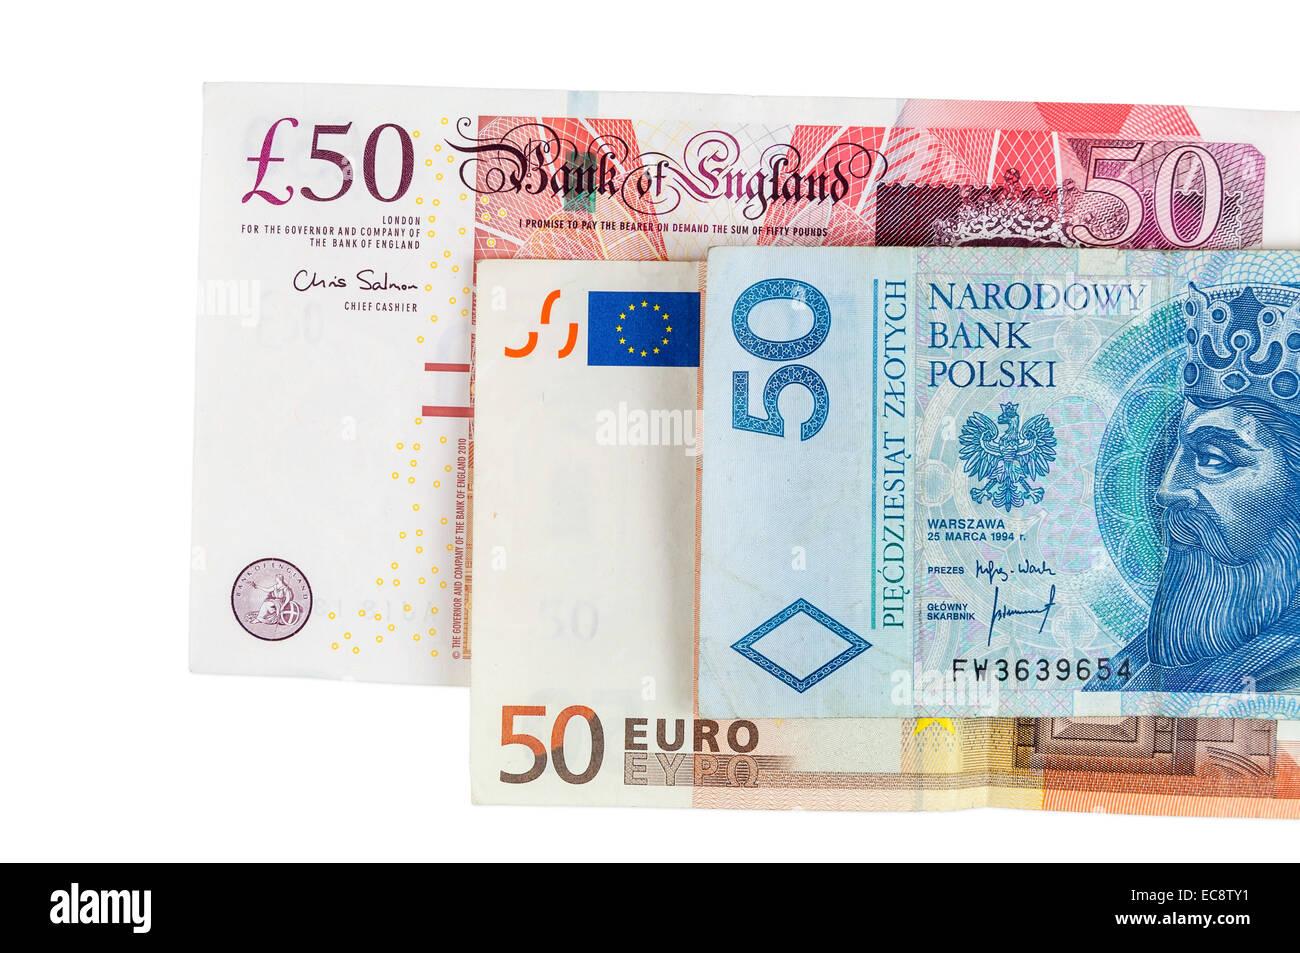 Cashback payday advance in san bernardino image 10